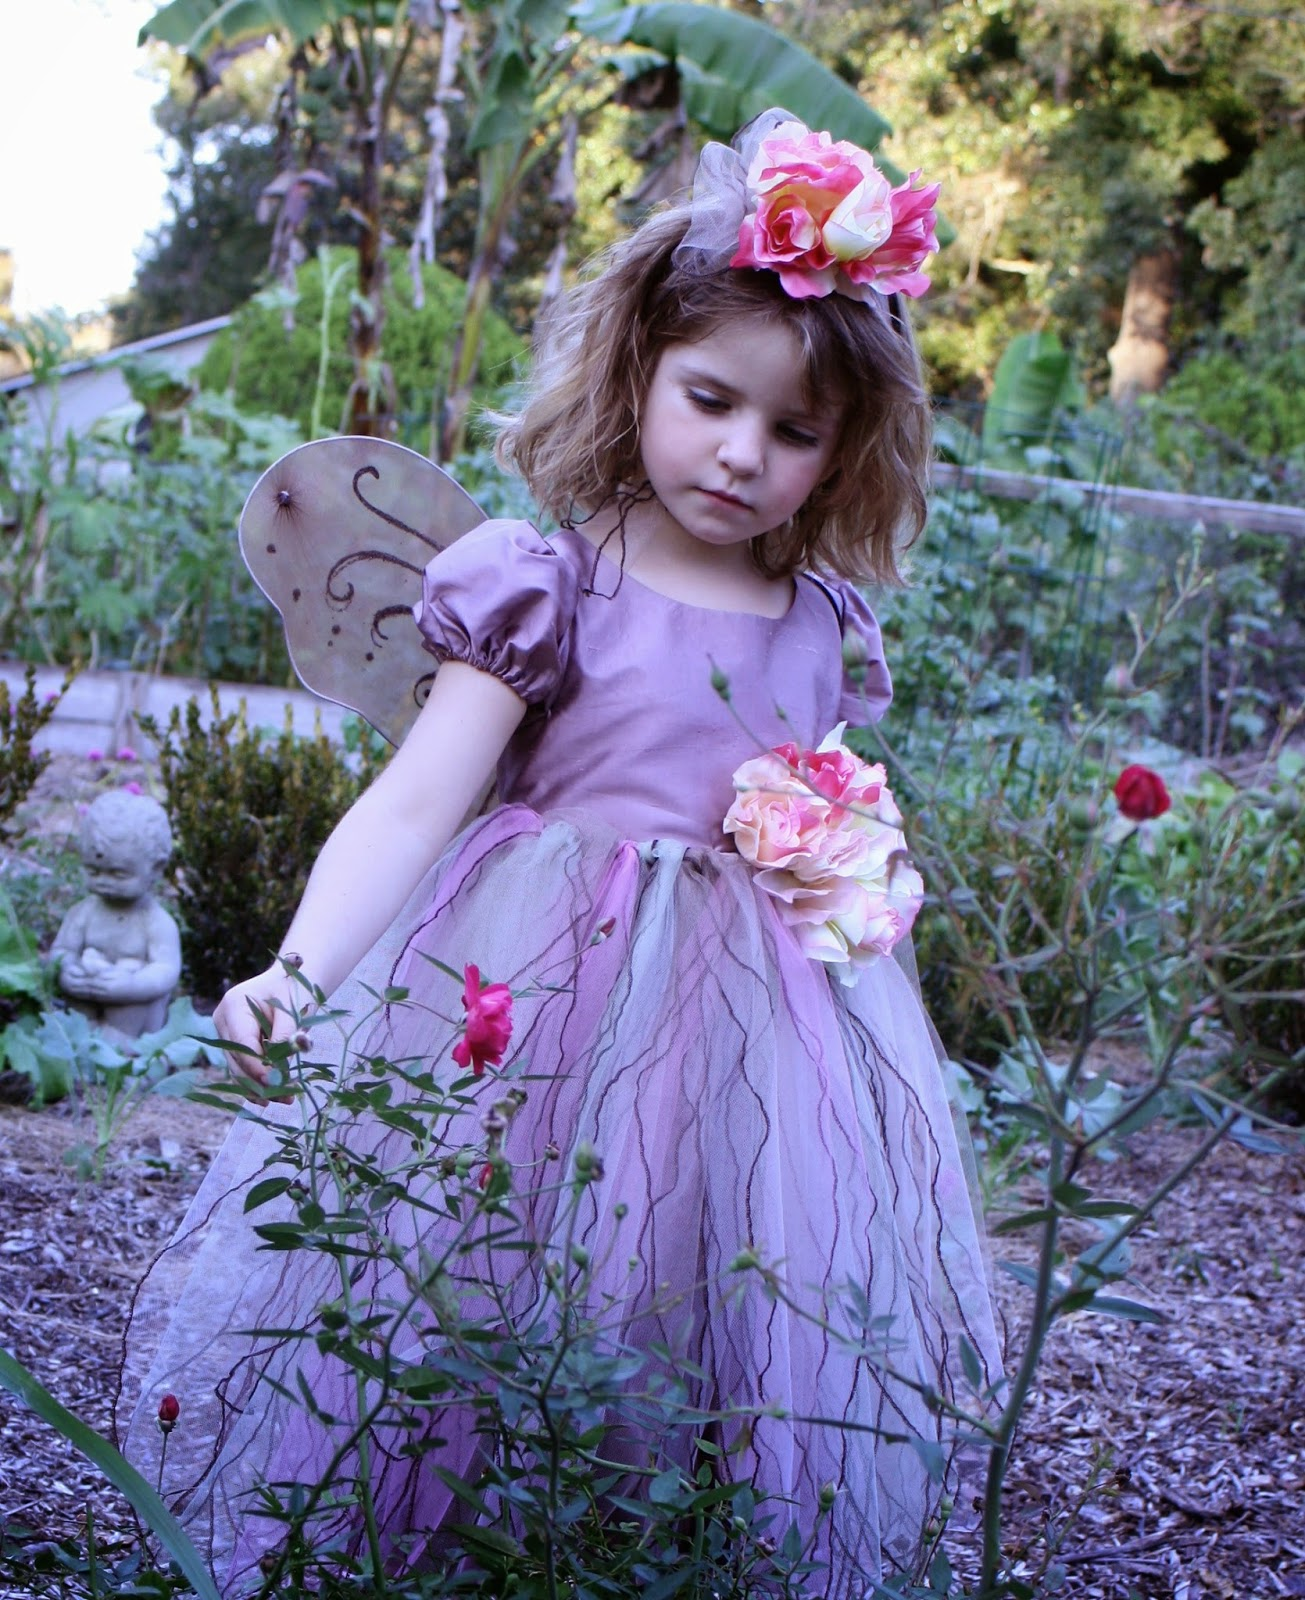 sew grown Garden Fairy Costume  sc 1 st  Garden Gallery - Blogger & sew grown: Garden Fairy Costume   Garden Gallery